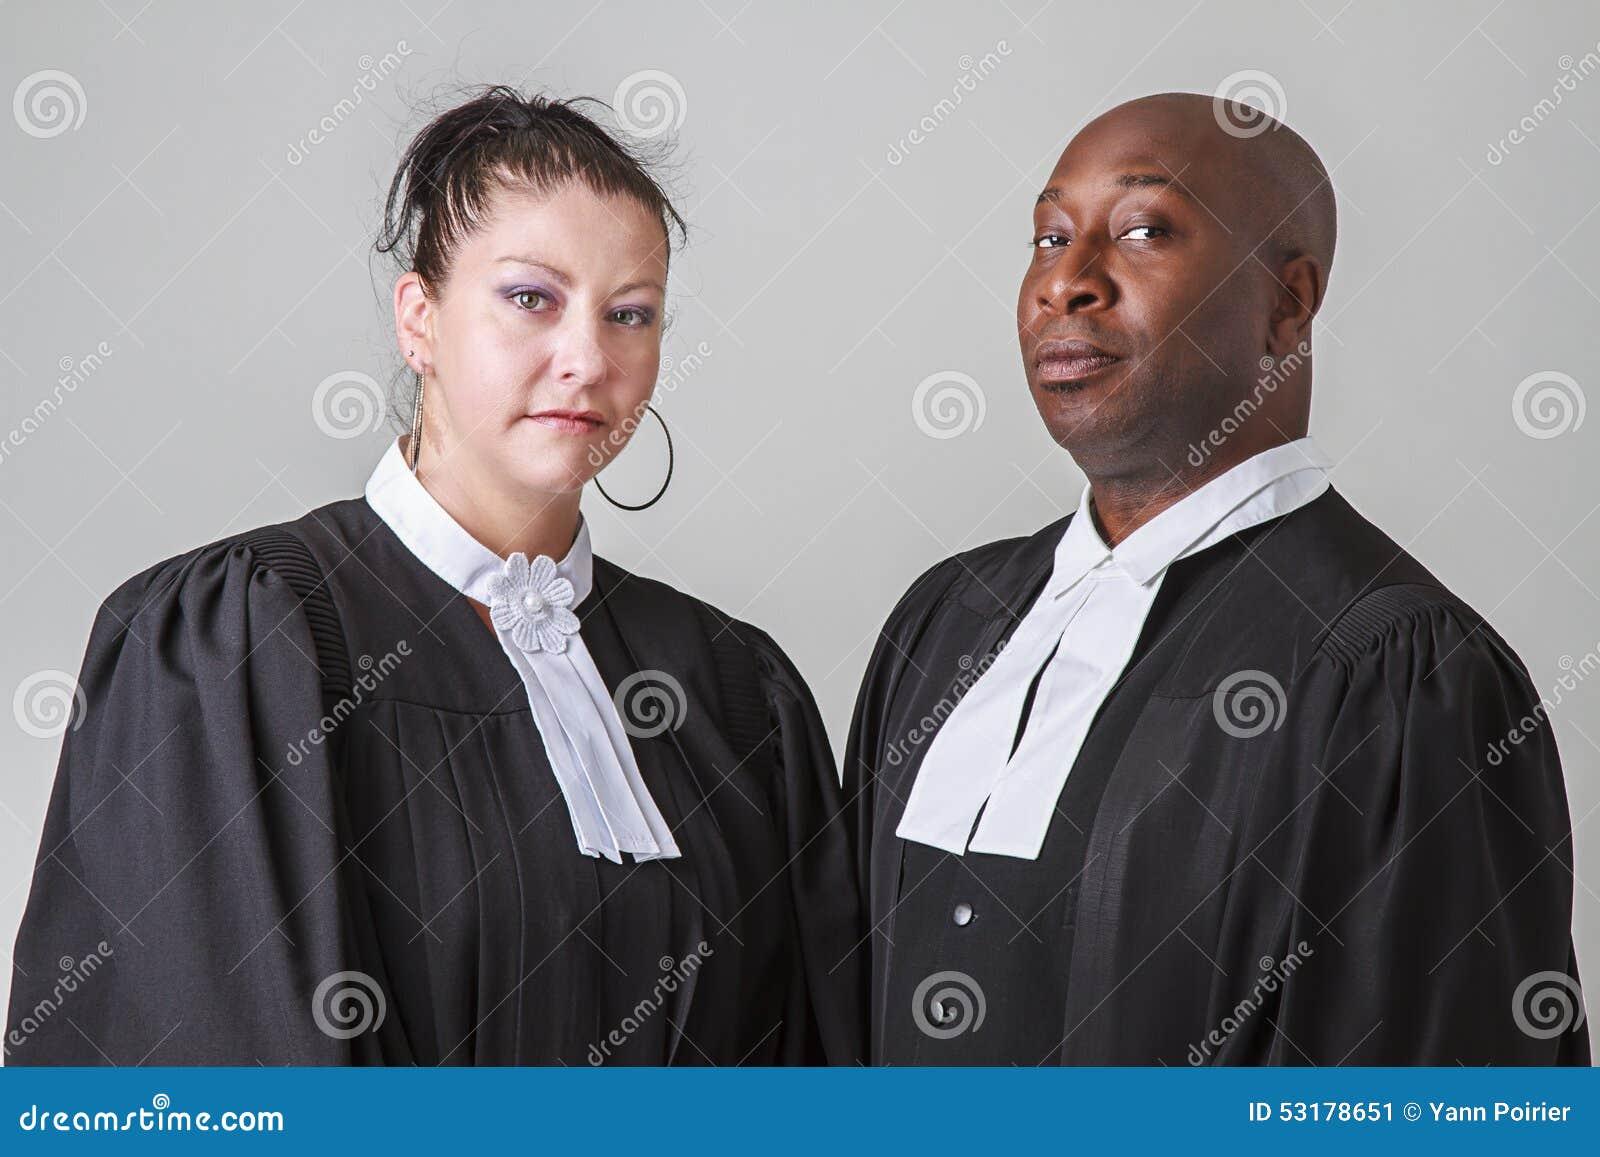 canadian women black men